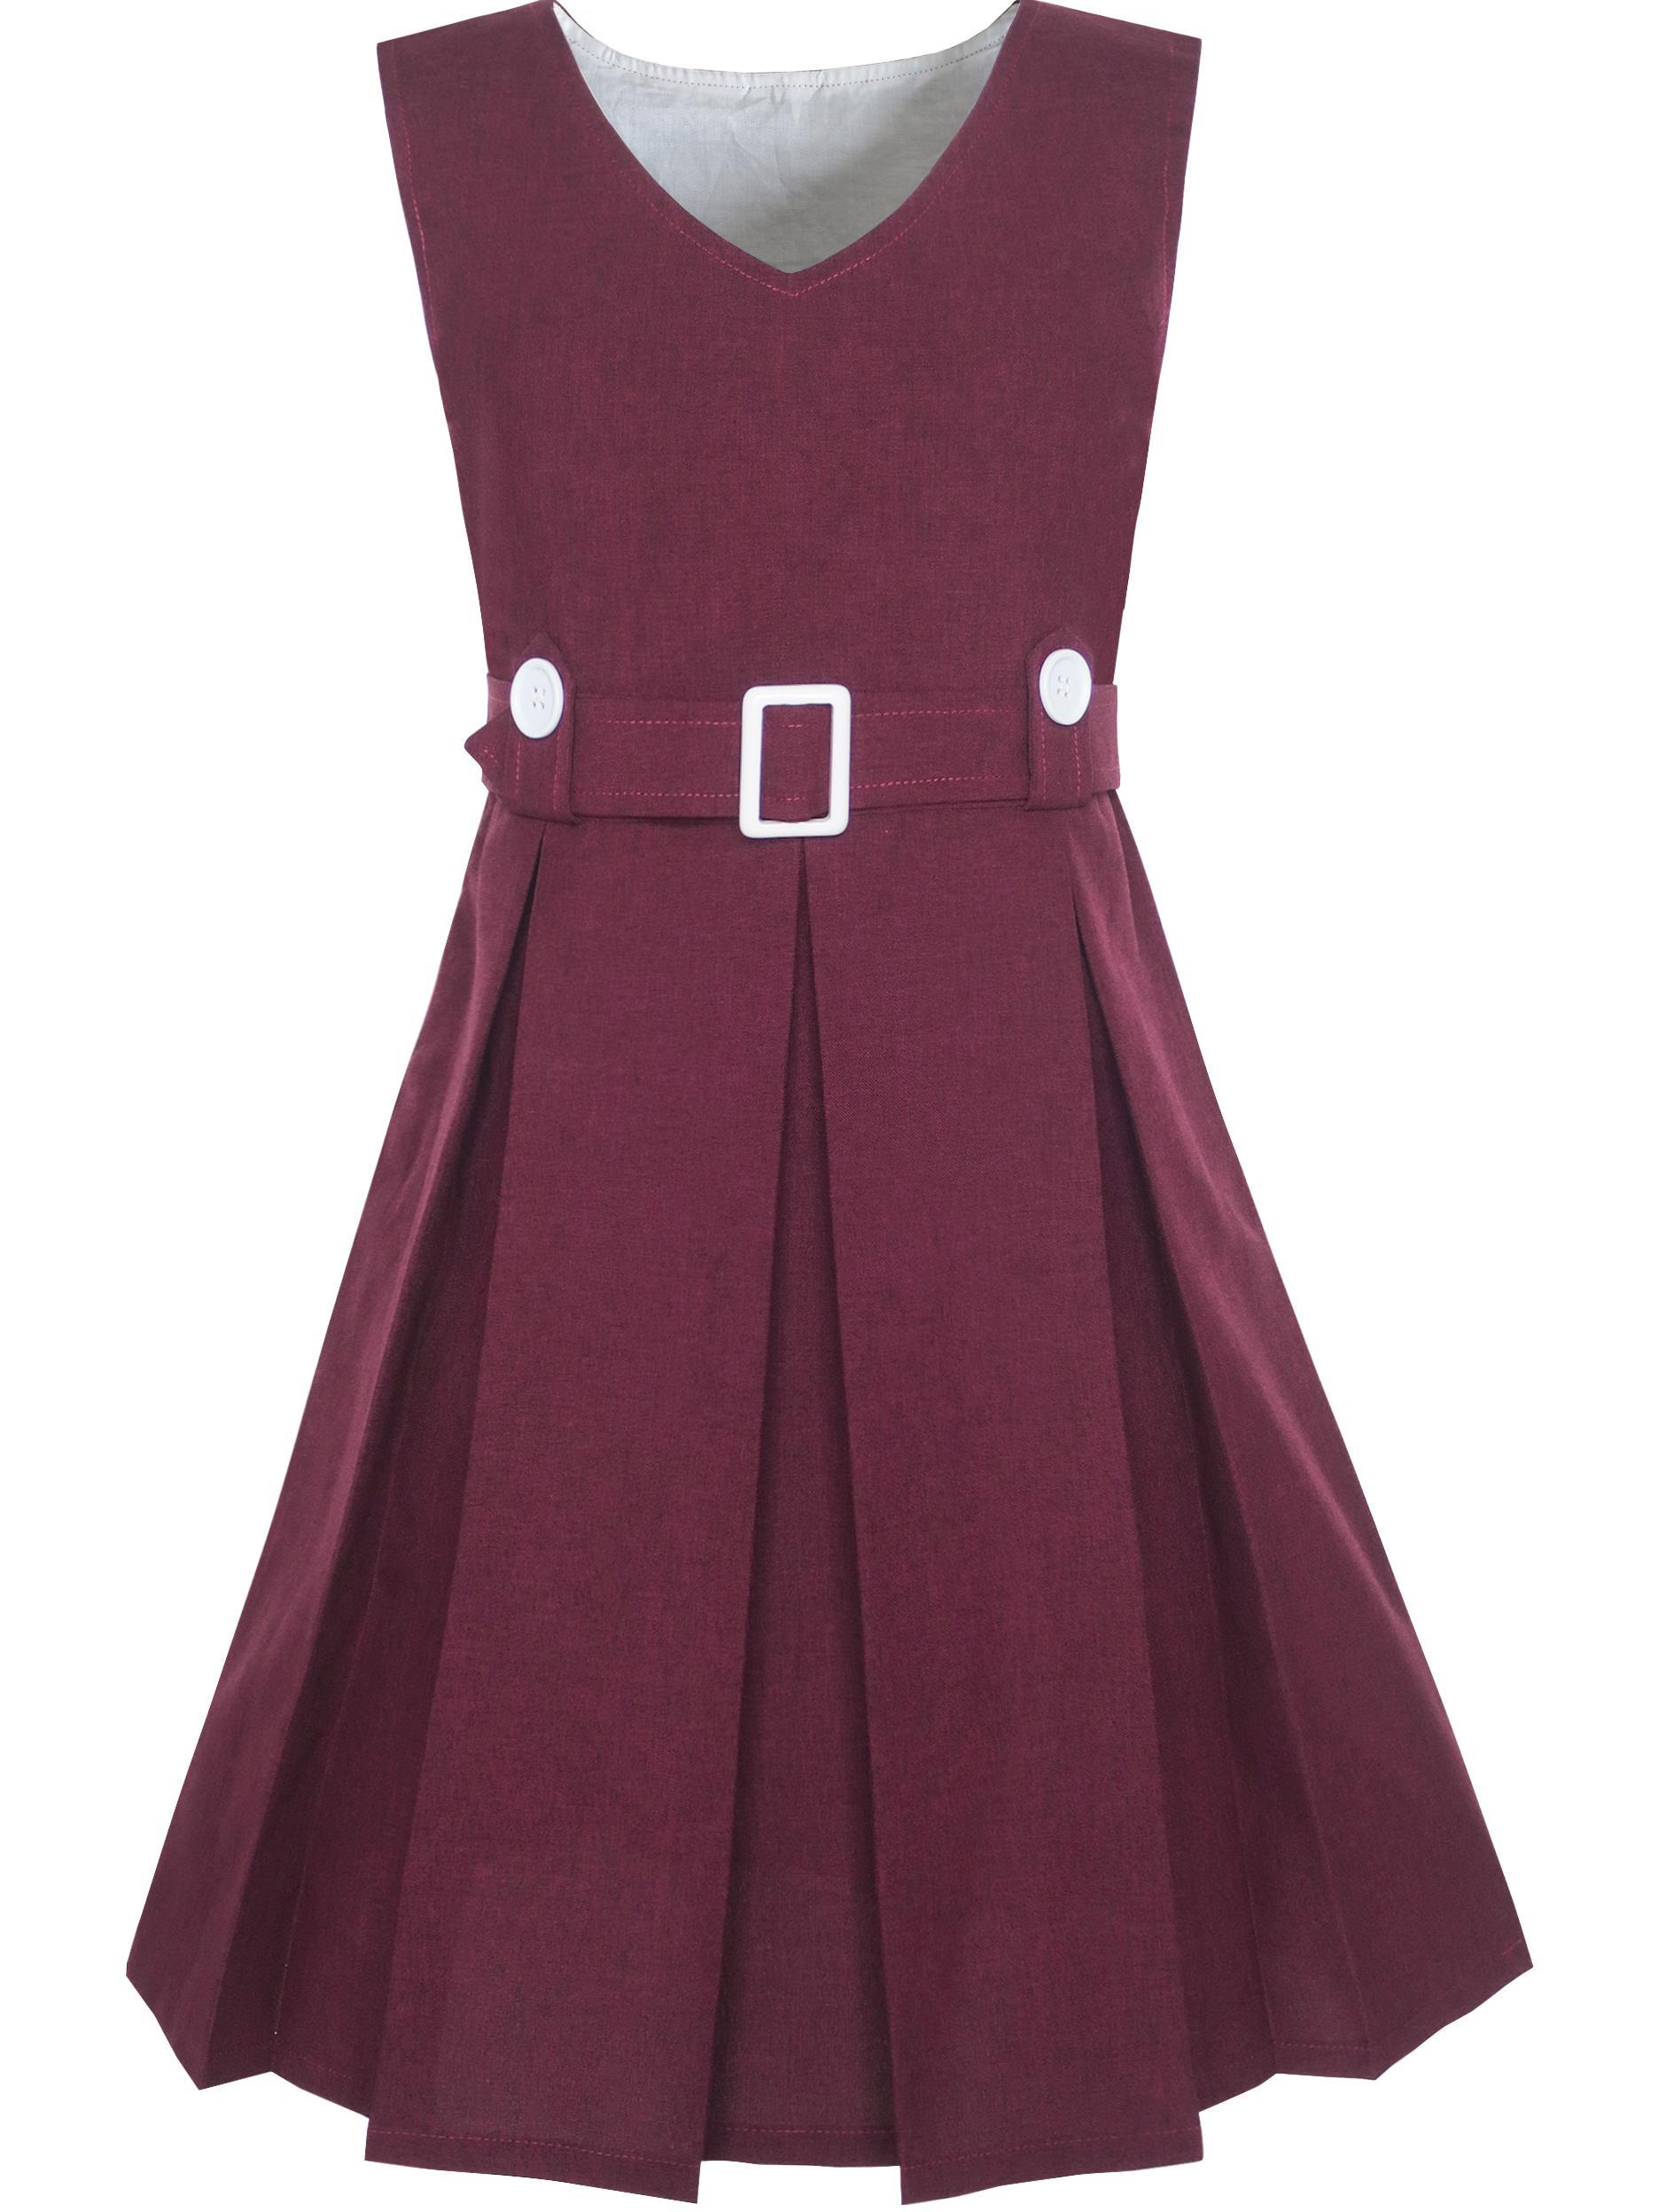 Girls Dress Khaki Button Back School Uniform Pleated Hem 6